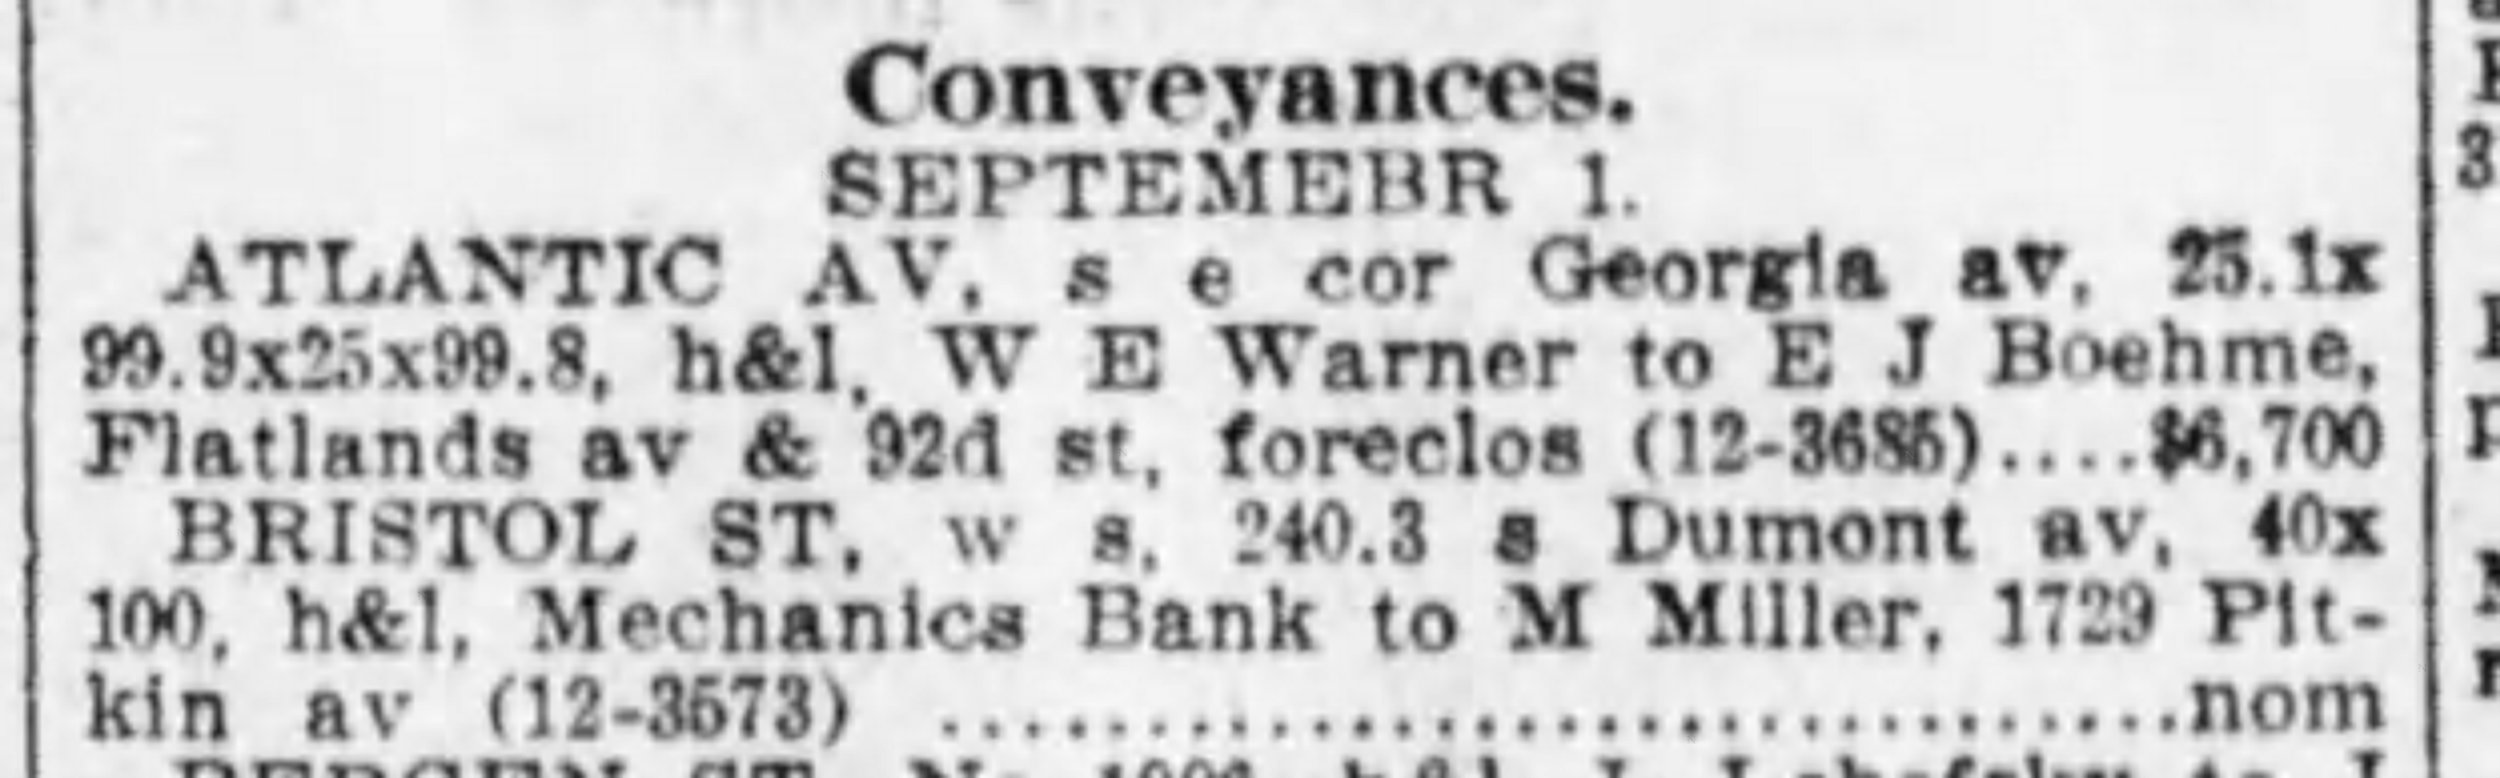 Brooklyn Daily Eagle 2 Sep 1914